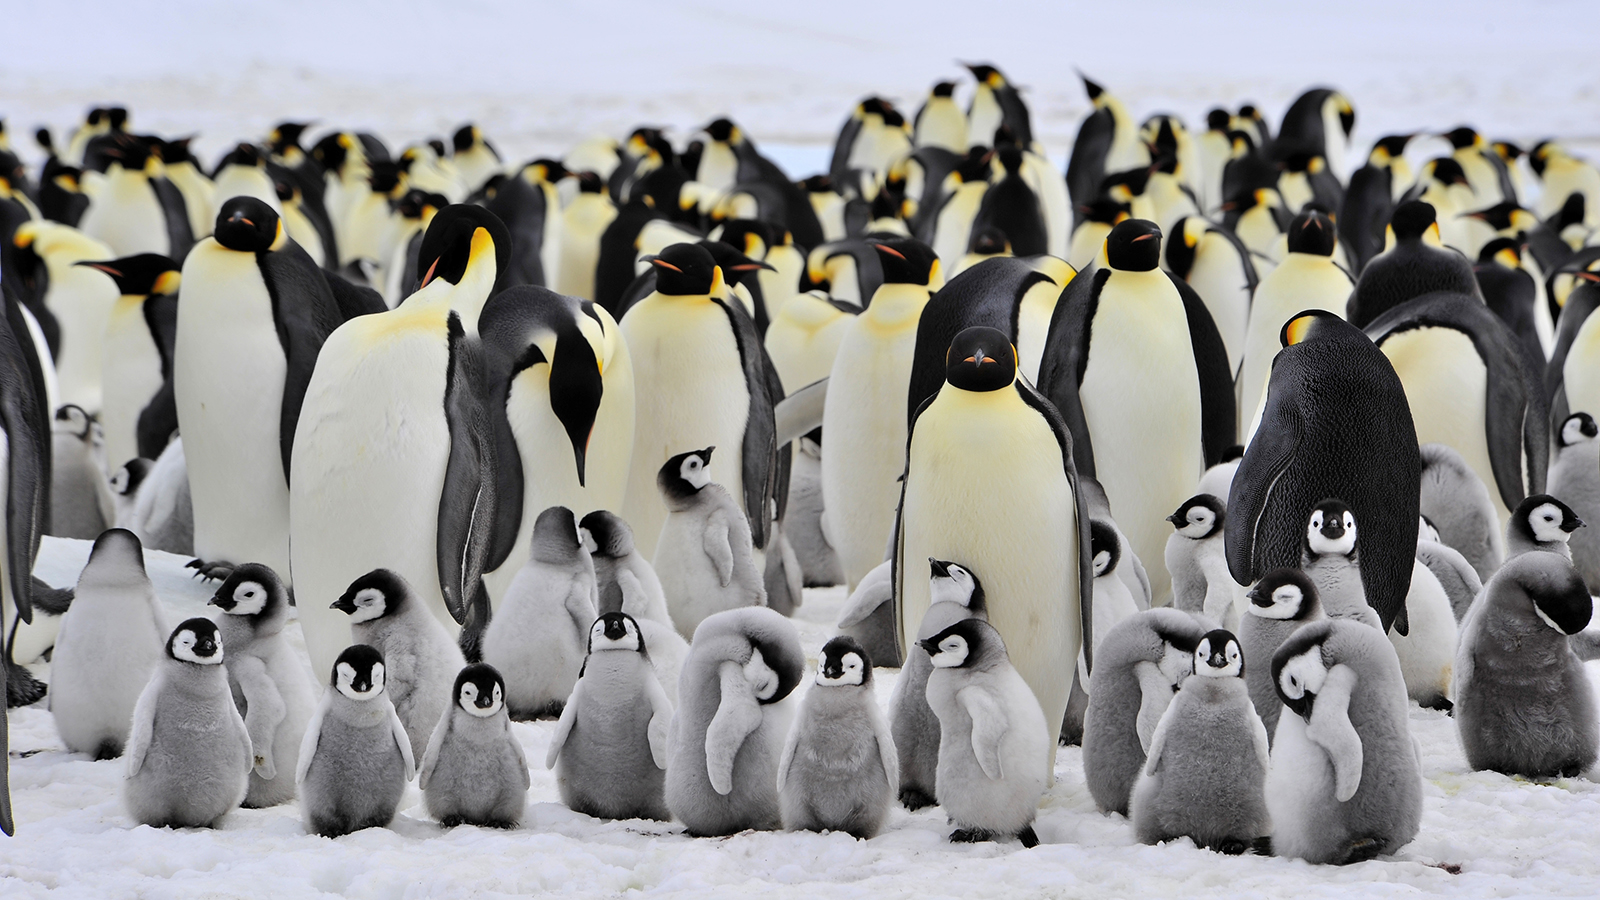 Emperor Penguin Backgrounds On Wallpapers Vista - Emperor Penguin , HD Wallpaper & Backgrounds